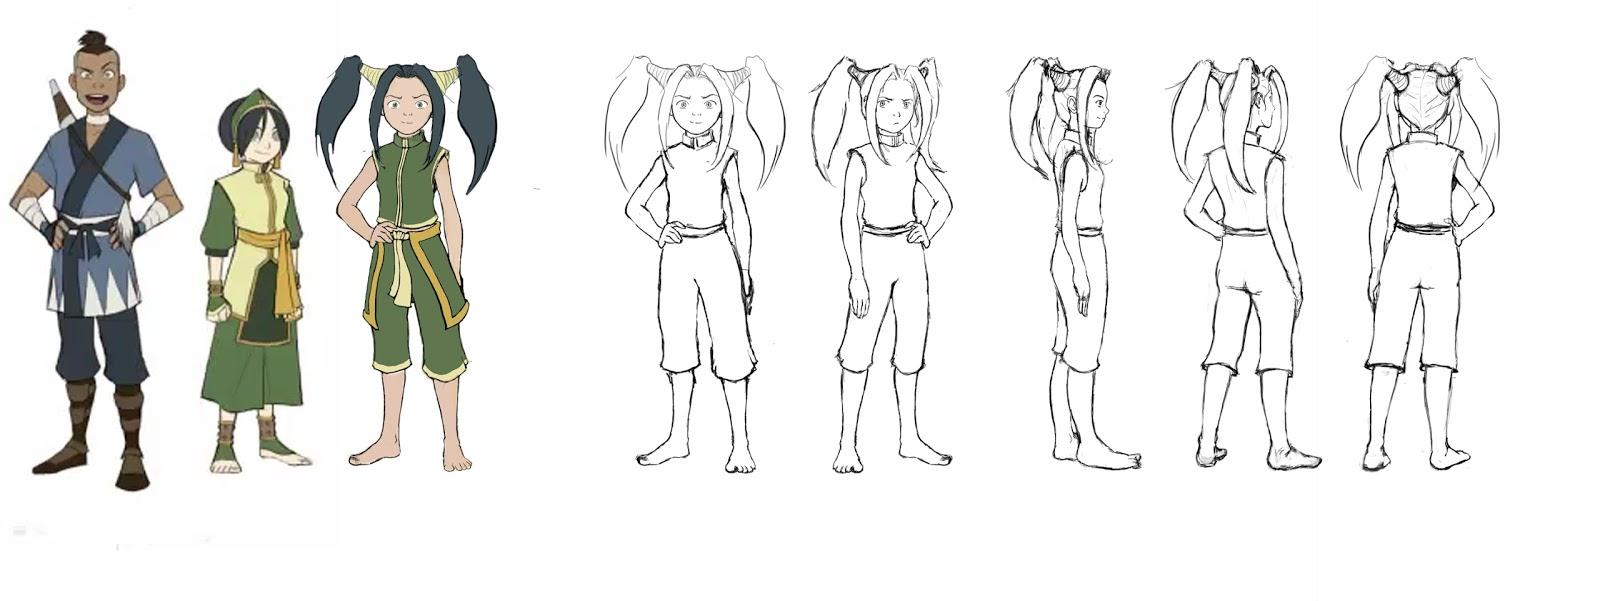 avatar character design gamo illustrations: avatar character design: shria edit +